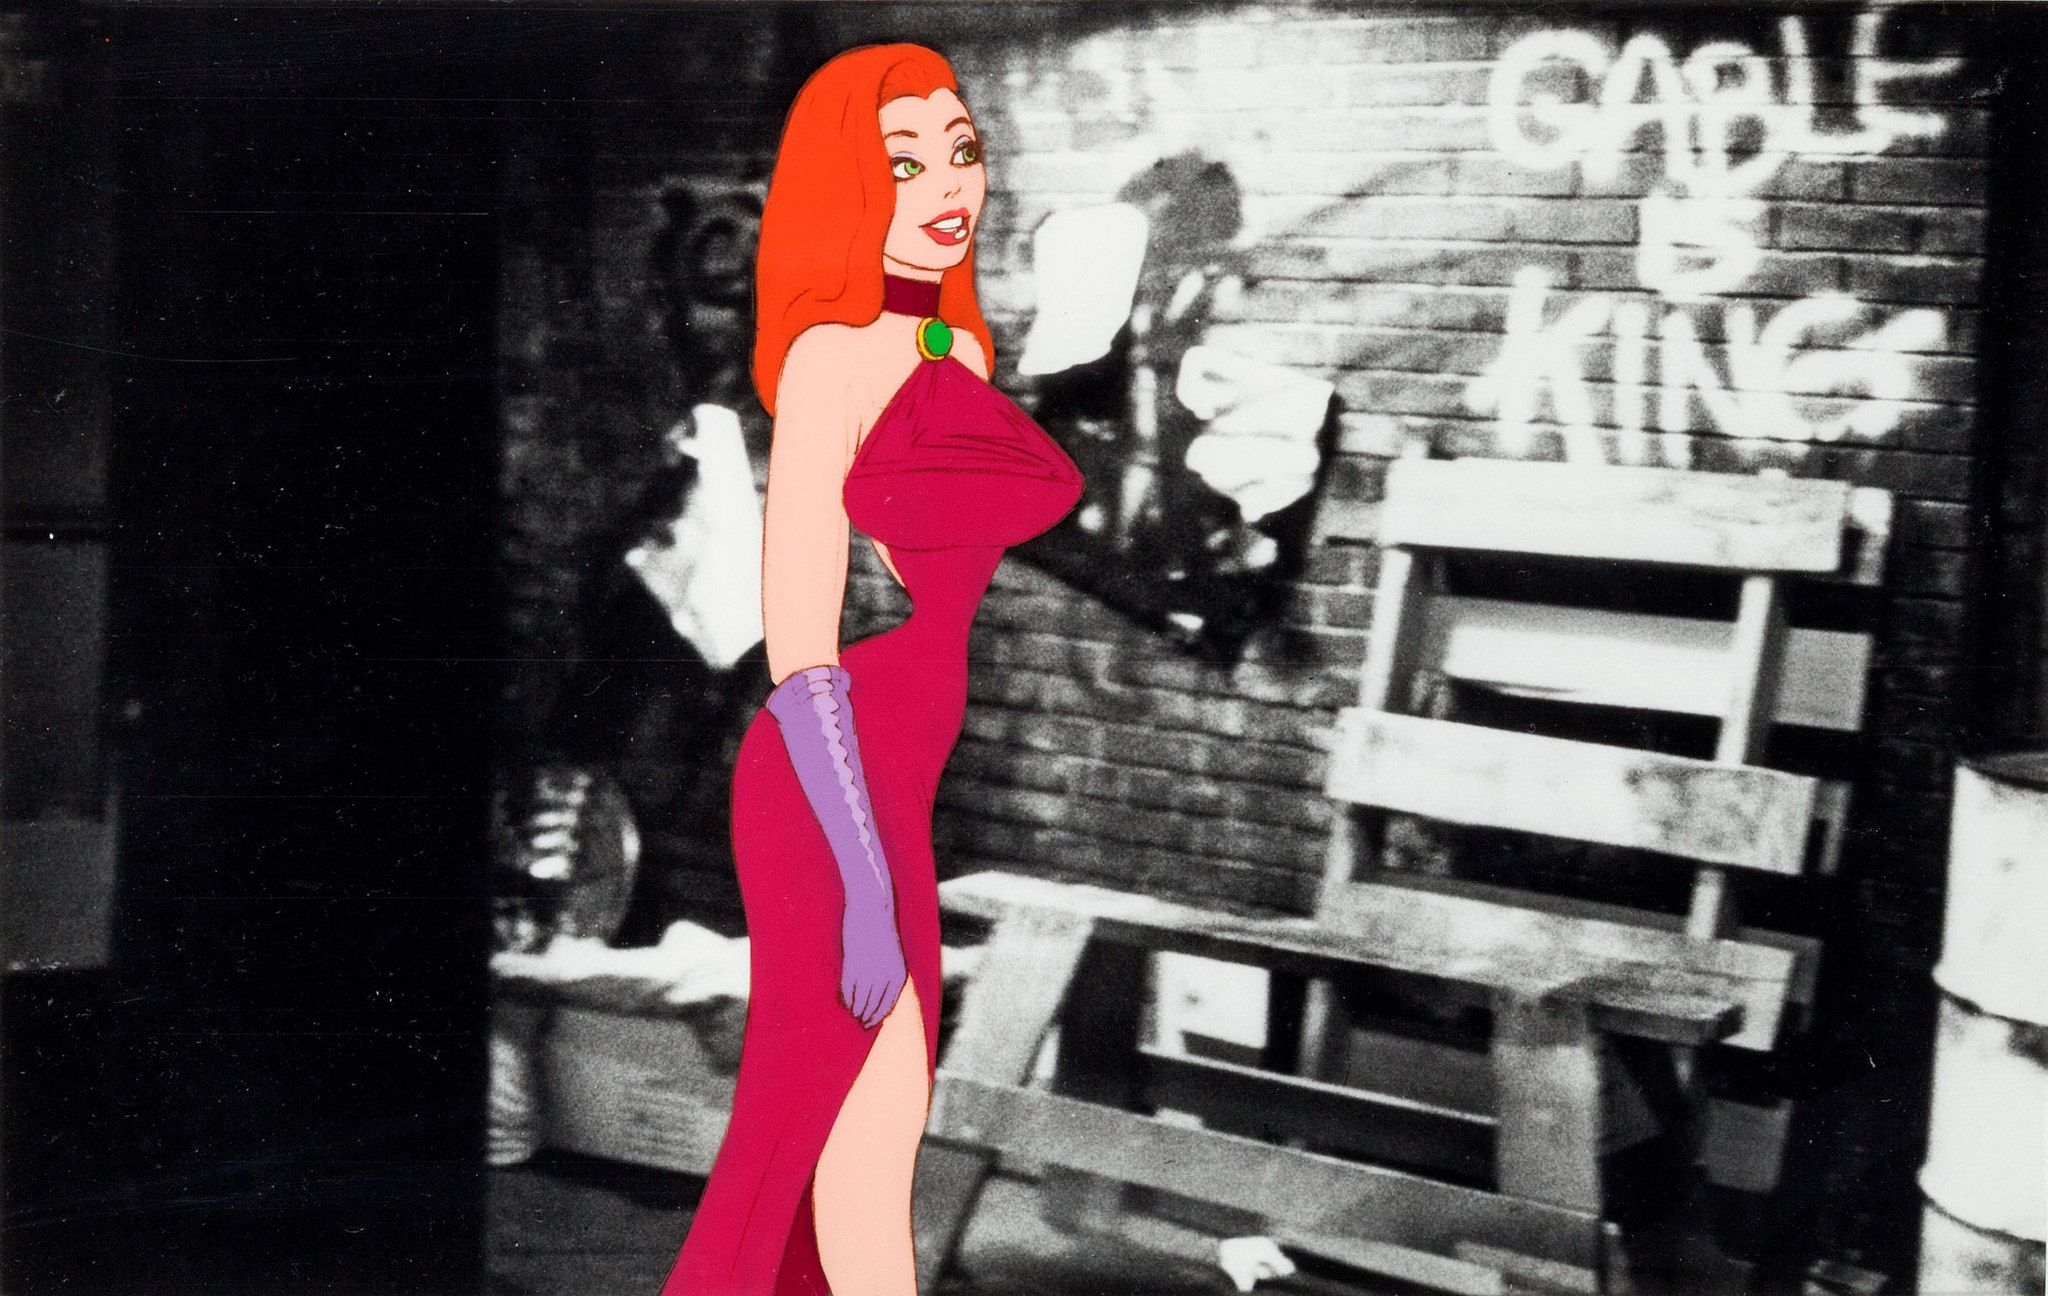 Jessica Rabbit concept art from Who Framed Roger Rabbit